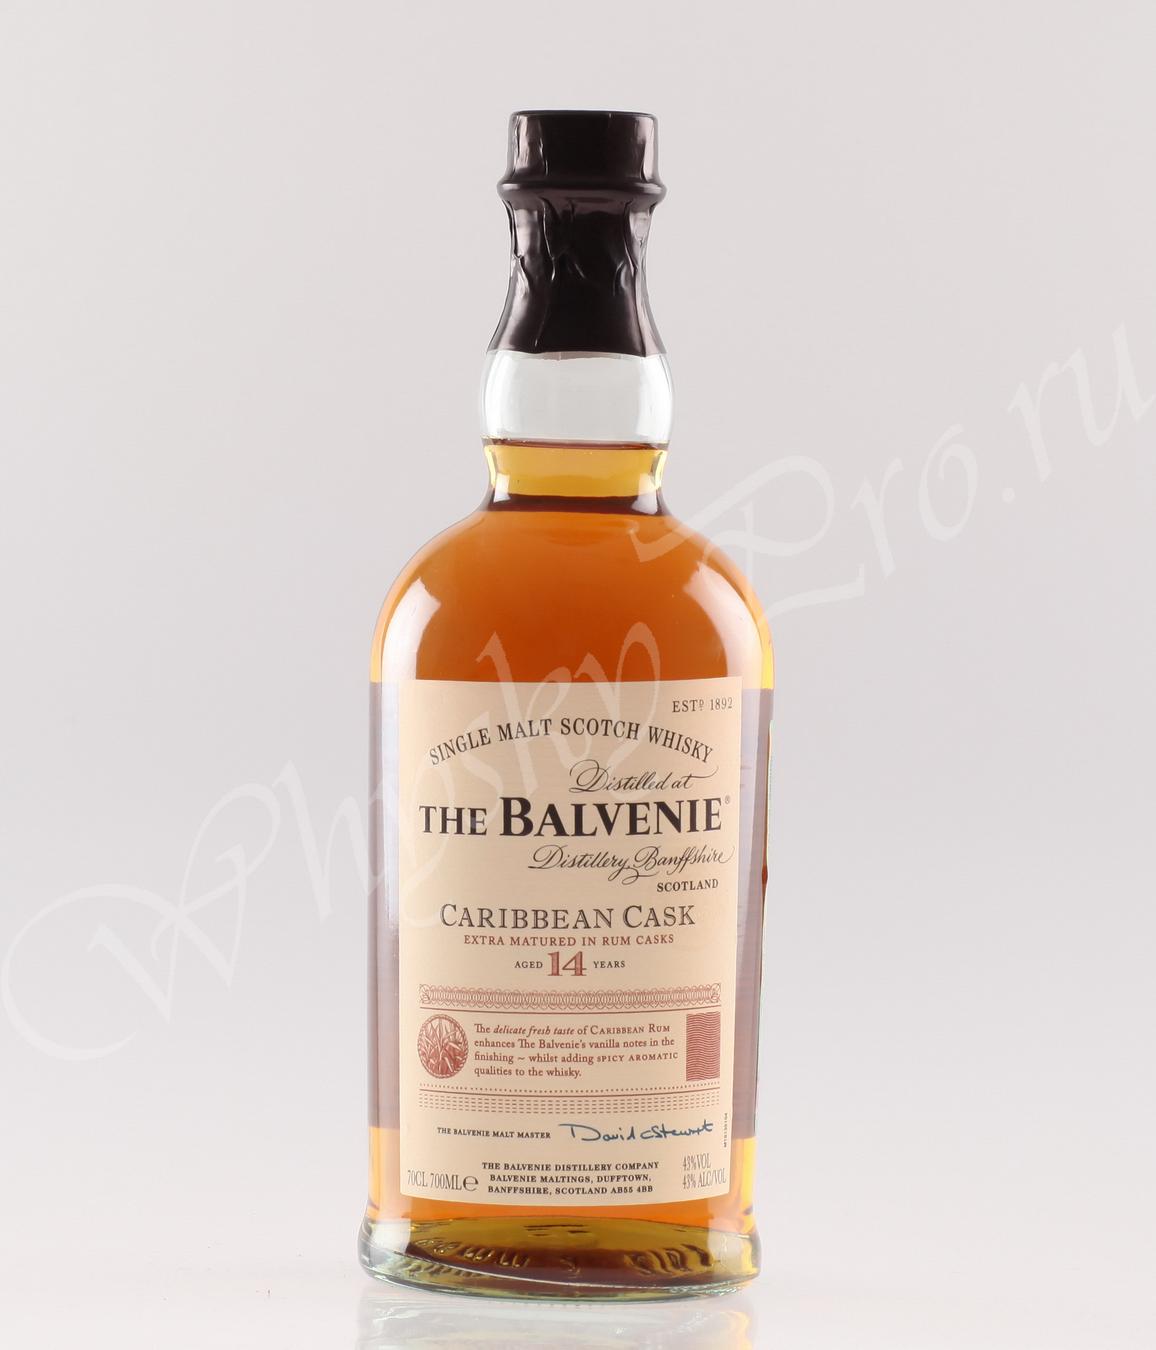 Balvenie 14 years